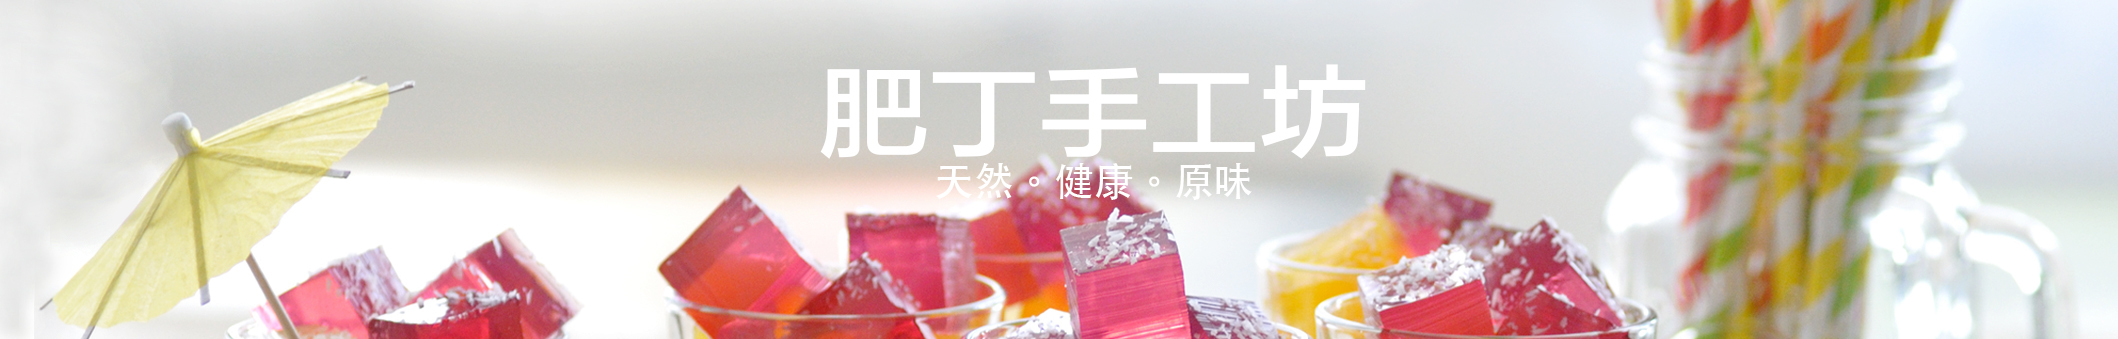 肥丁手工坊 banner